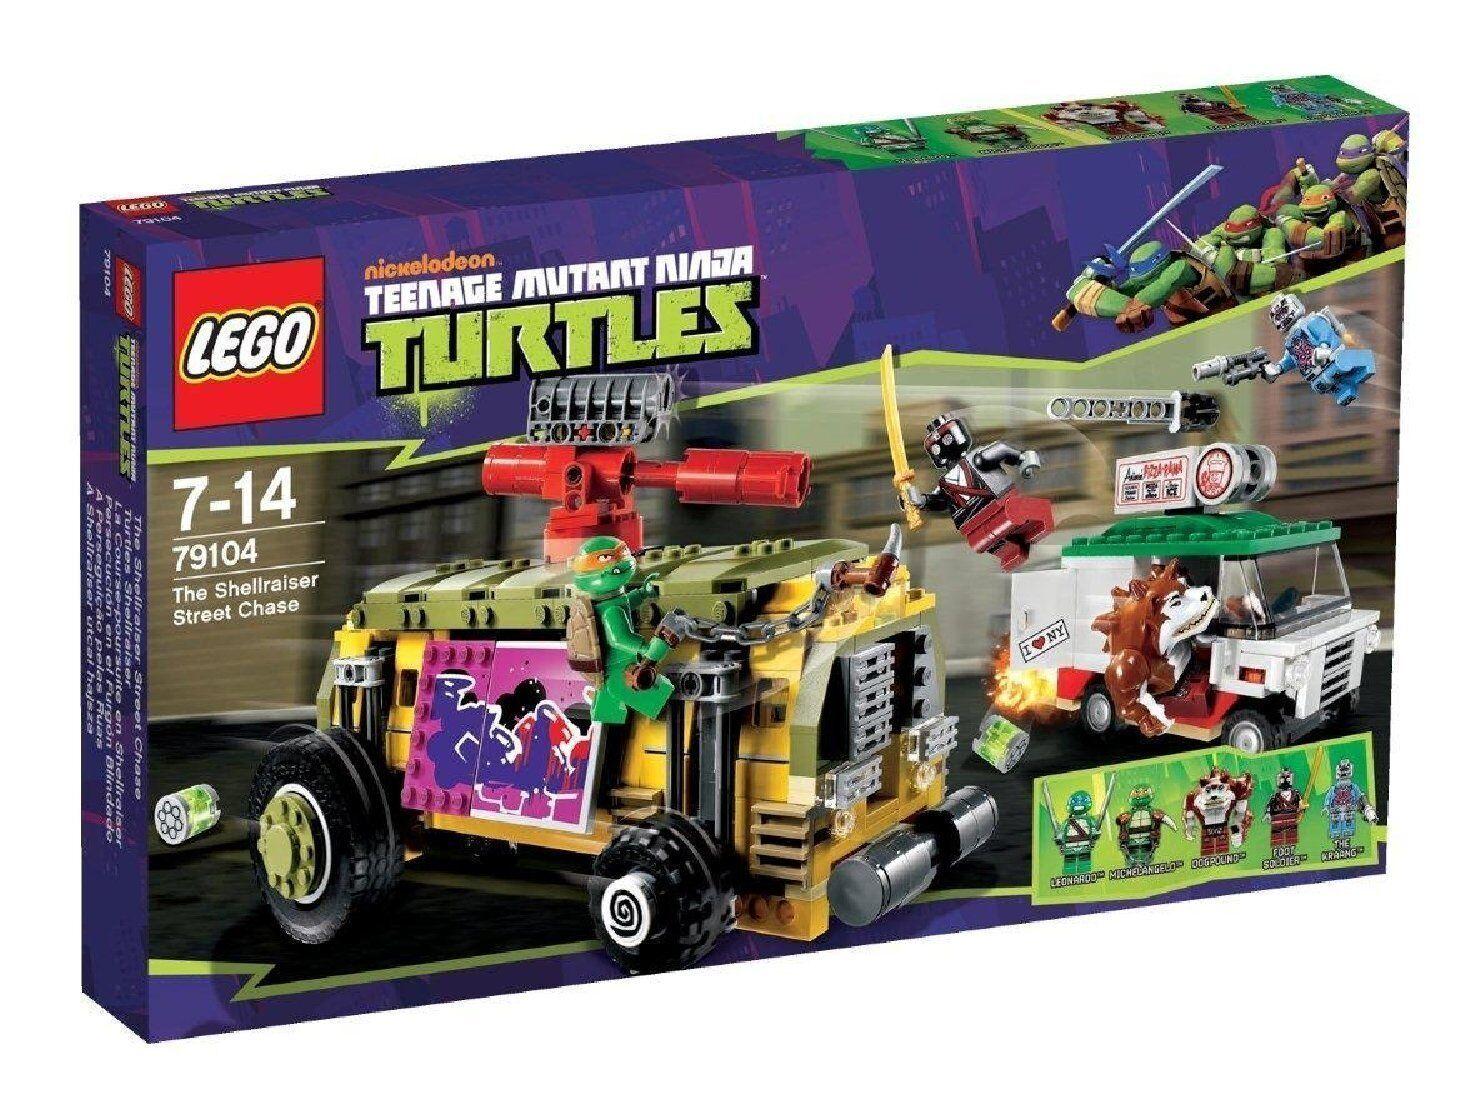 Lego Tortues Ninja™ 79104 Tortues Tortues Tortues Shellraiser Neuf Emballage D'Origine (B-Ware) 2e73d7